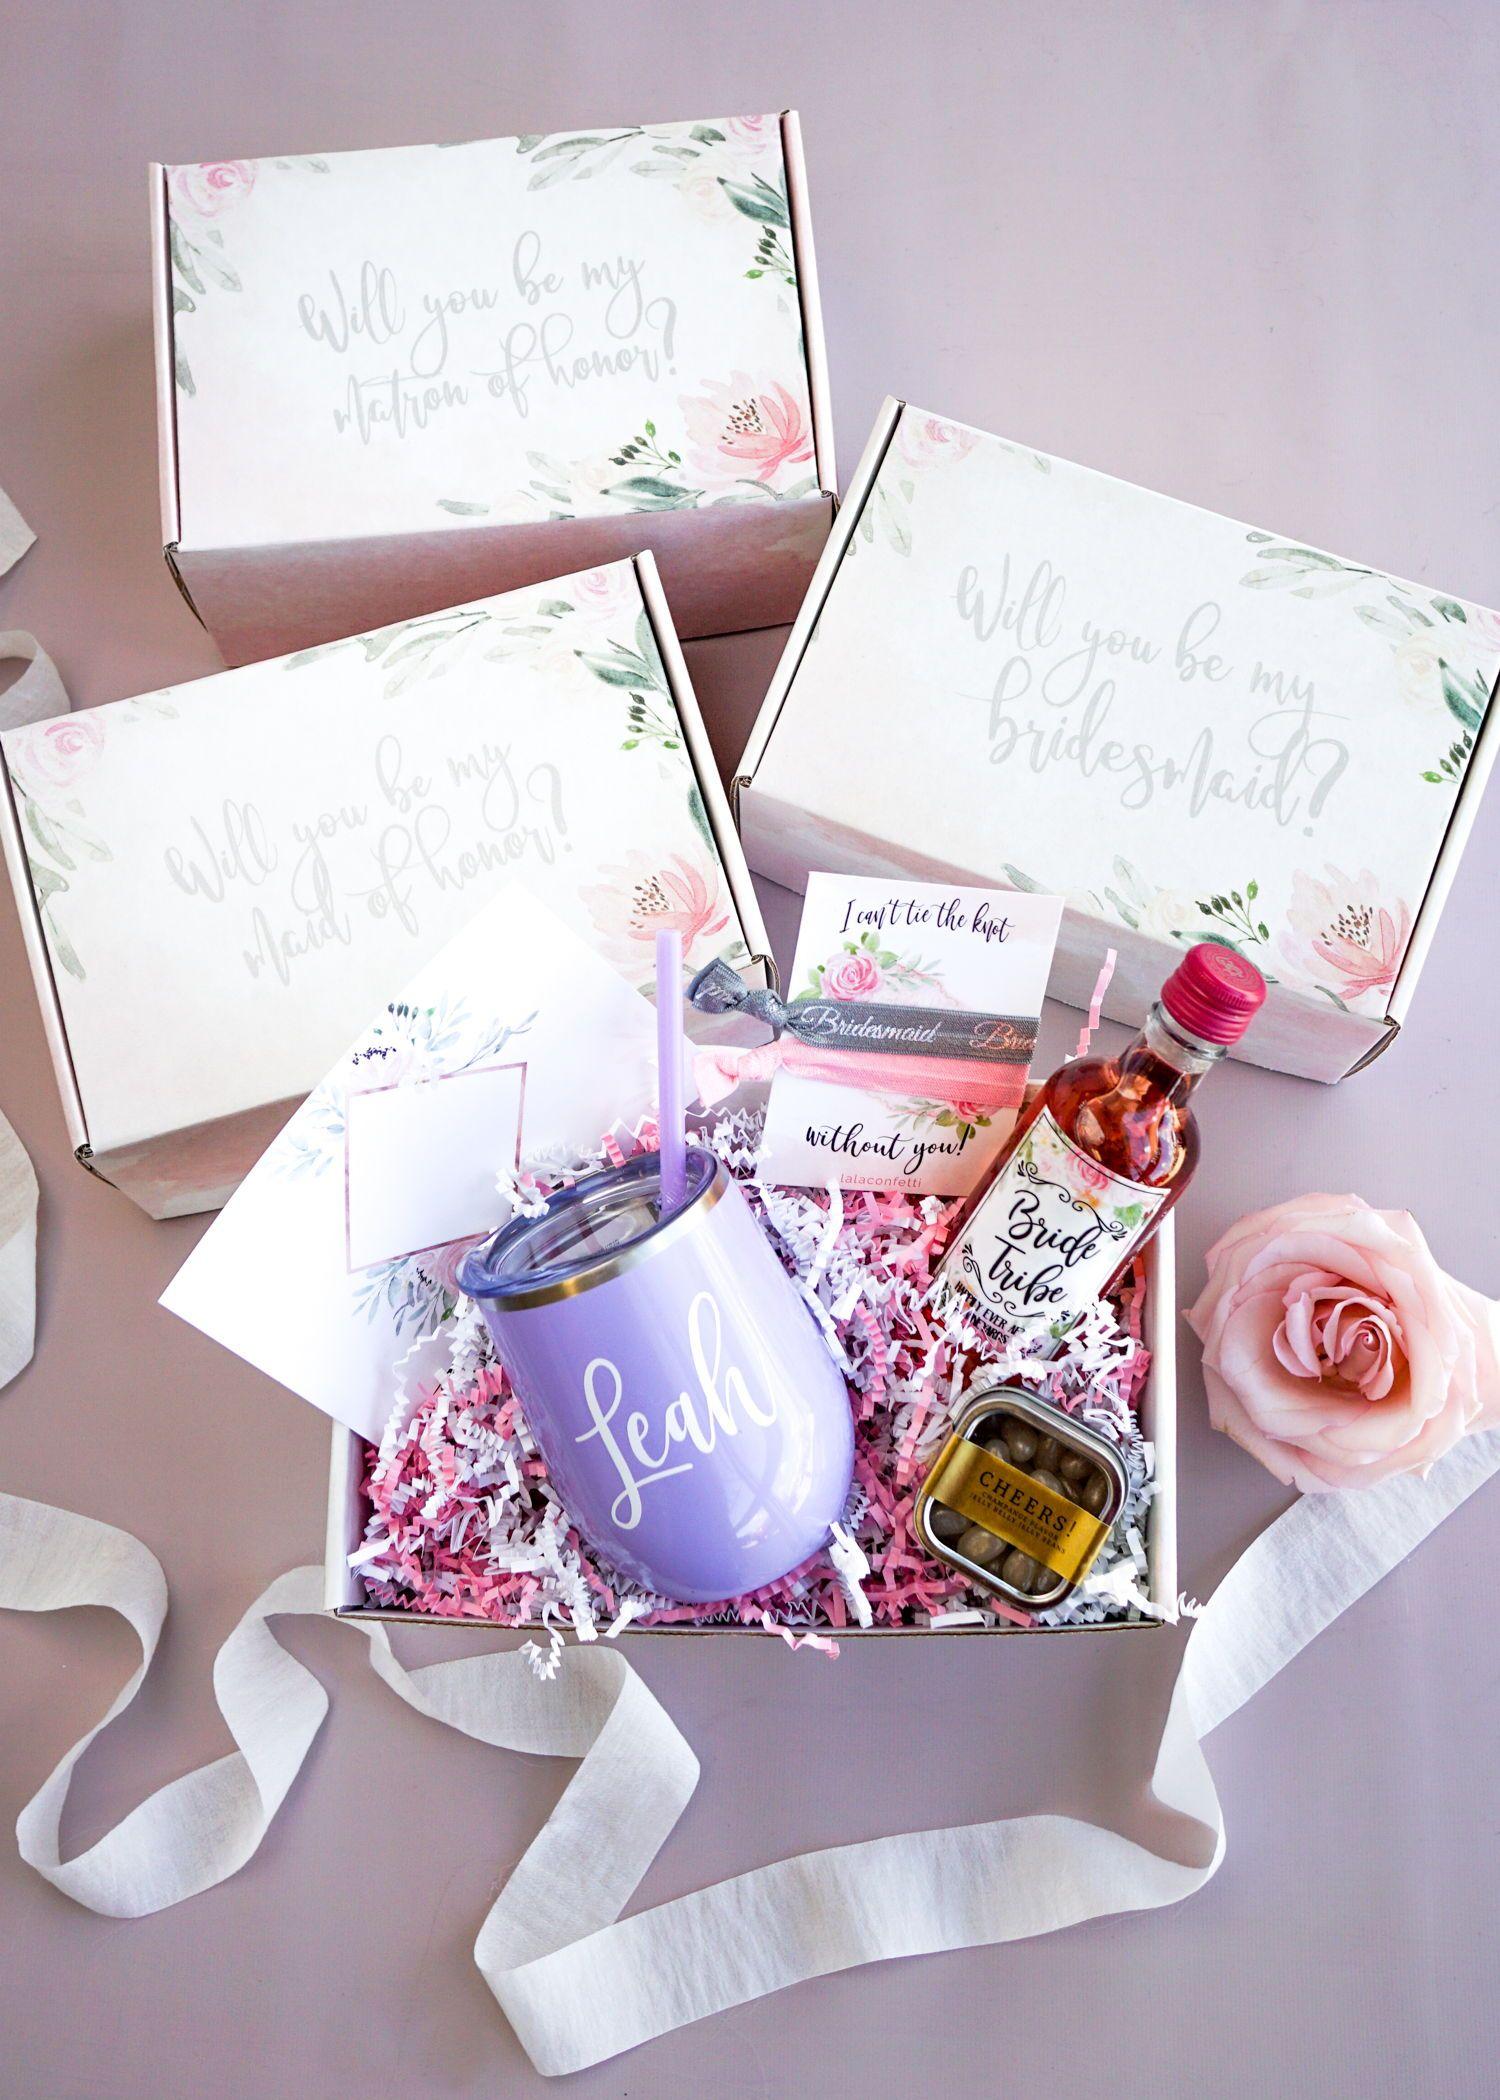 Bridesmaid proposal box original edition bridesmaid